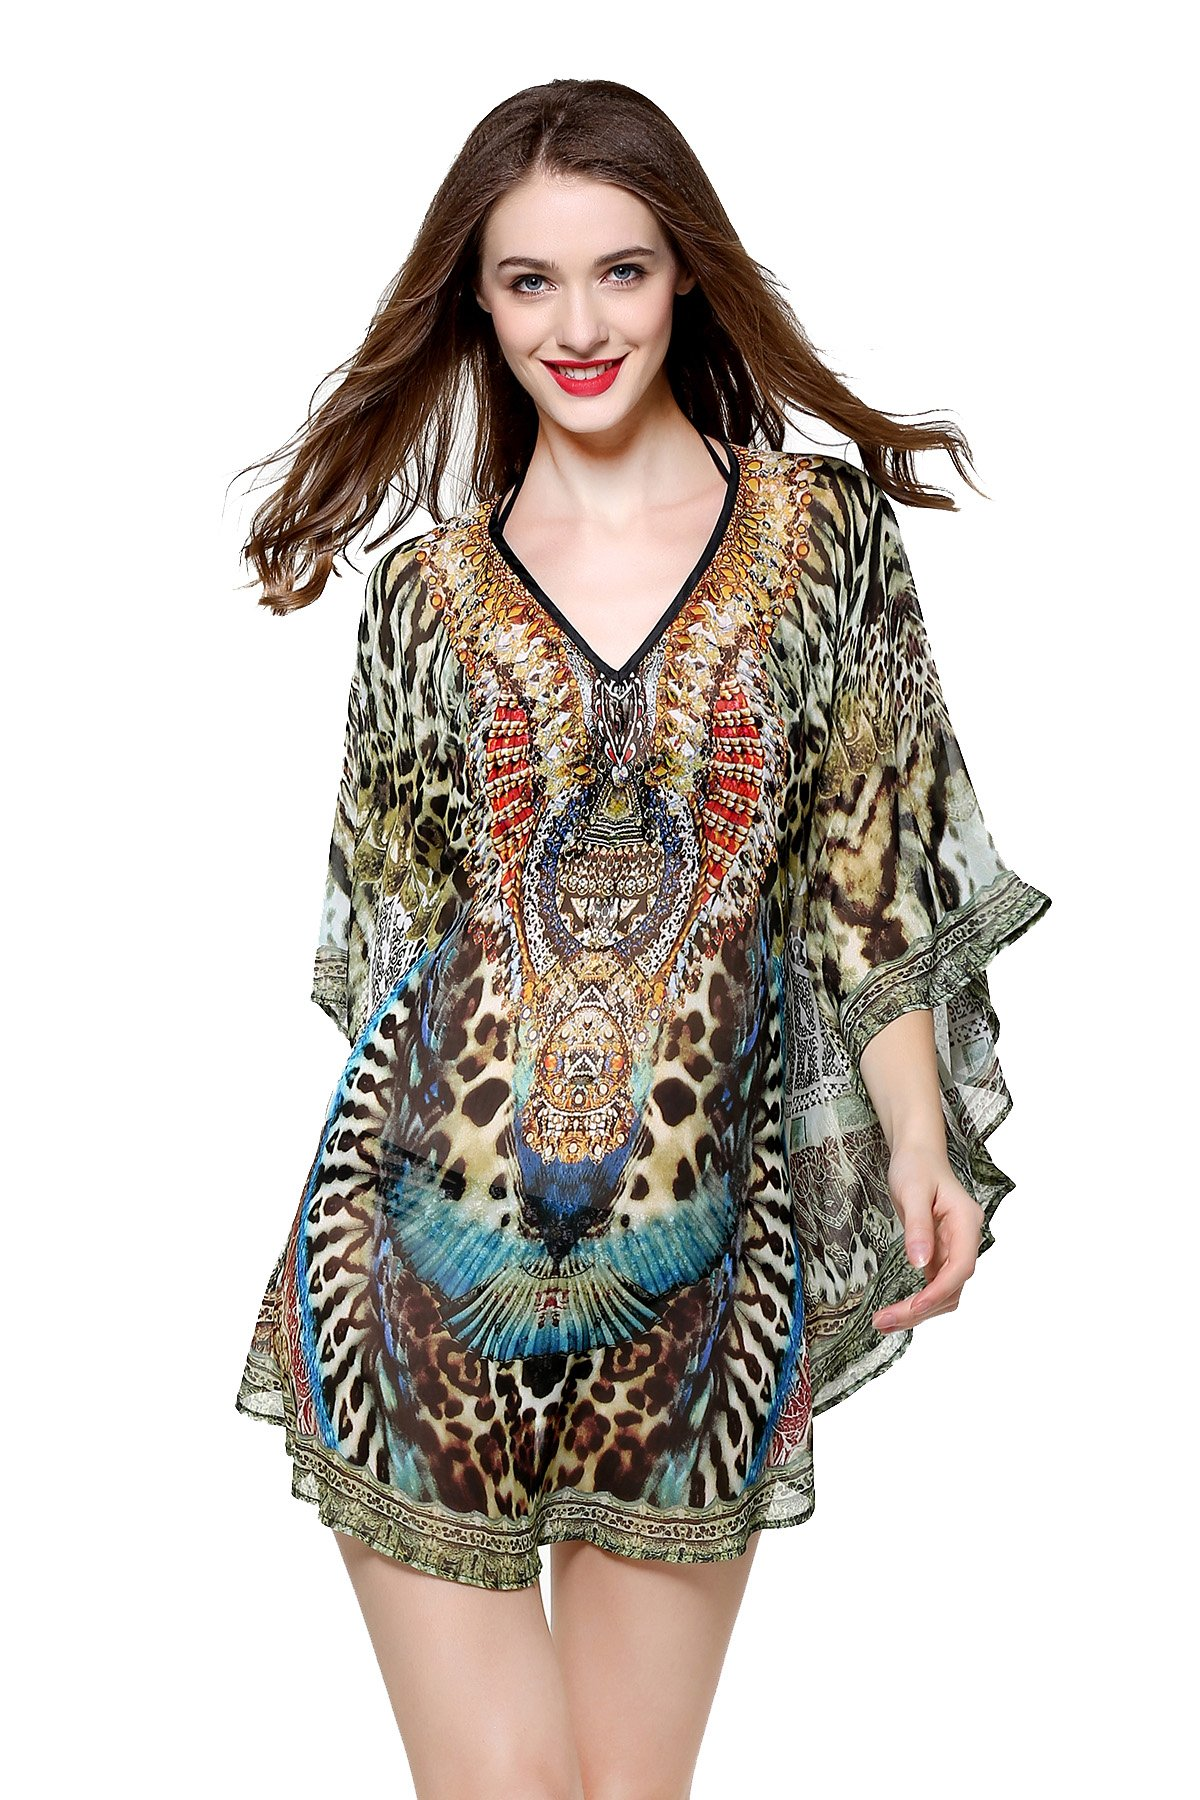 MYPASSA Cover Ups for Swimwear Women Summer Leopard Floral Chiffon Bathing Suit